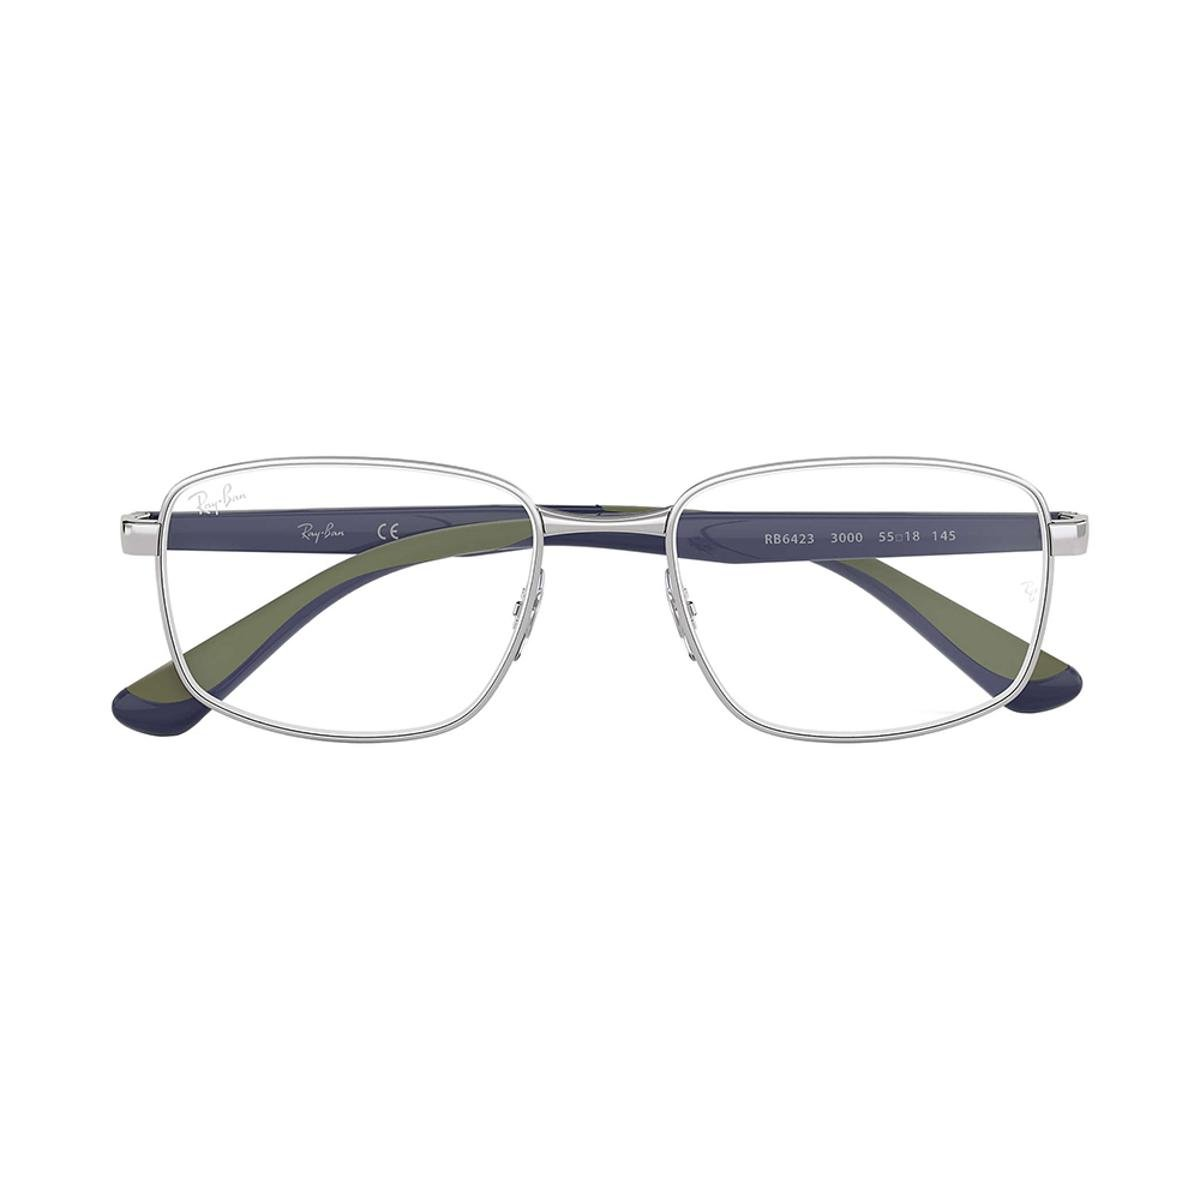 9c32f97e6abd2 Óculos de Grau Ray-Ban RB6423 Masculino - Azul - Compre Agora   Zattini